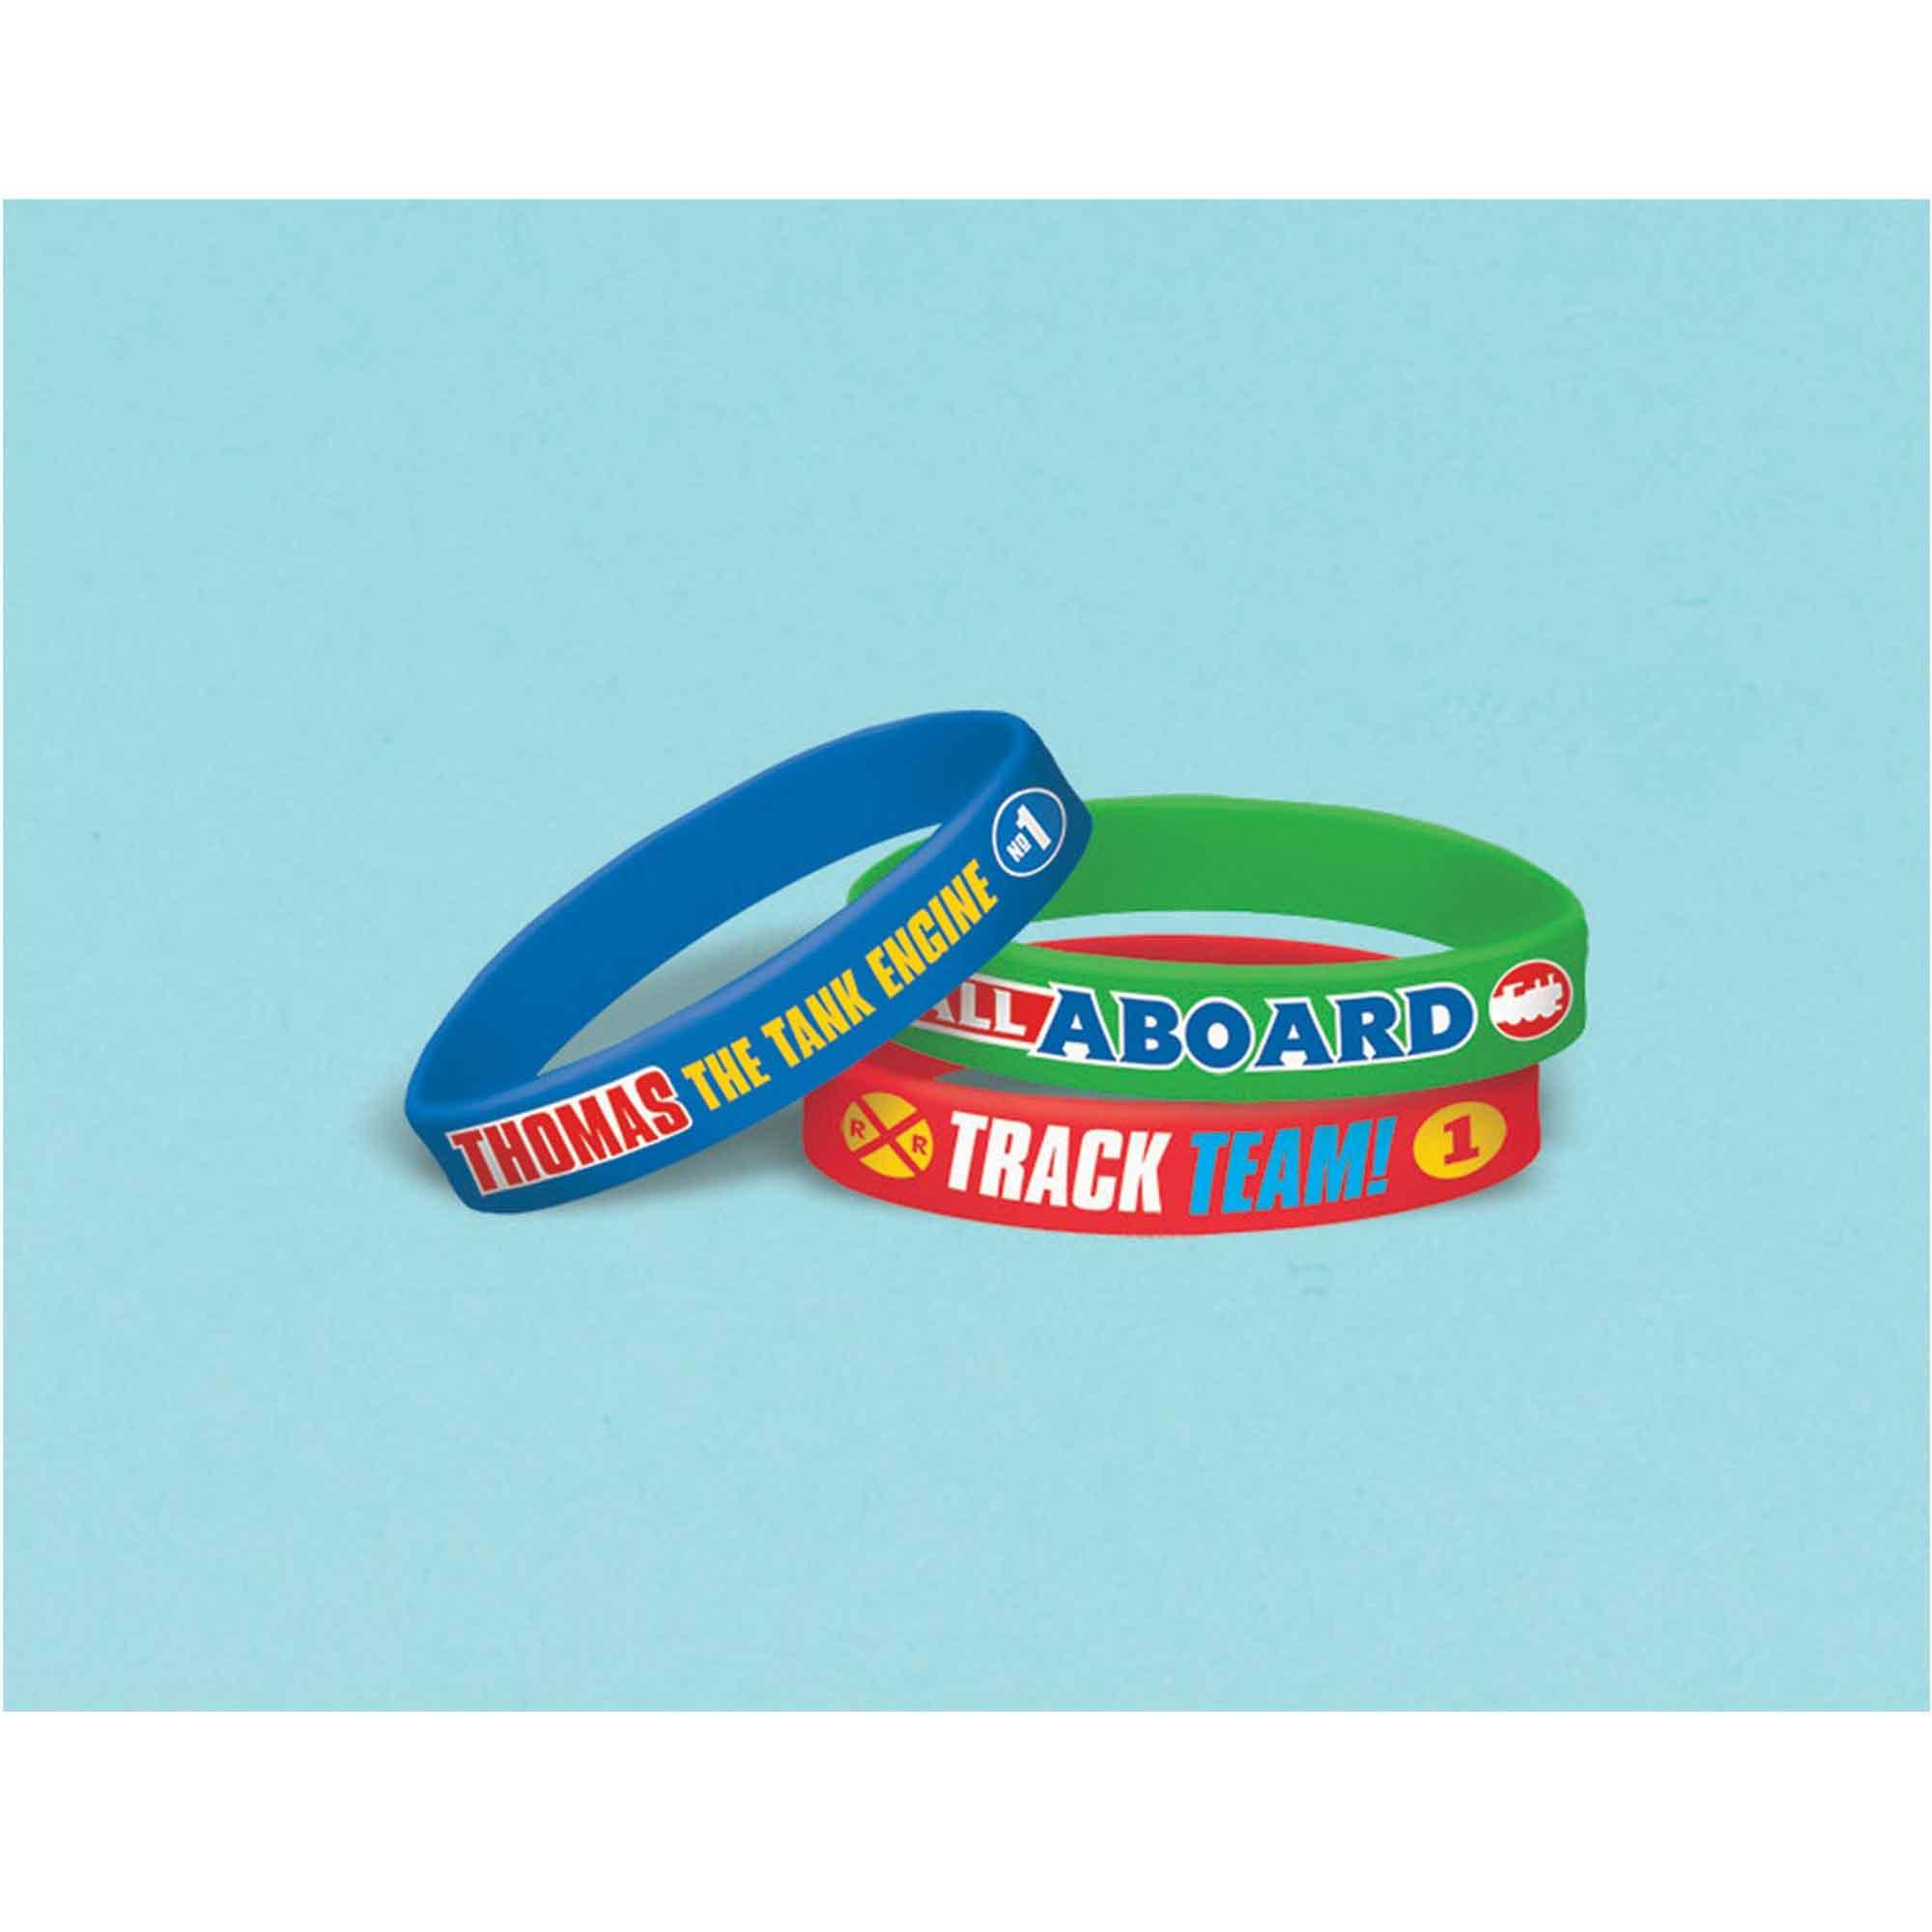 Thomas All Aboard Rubber Bracelet Favors